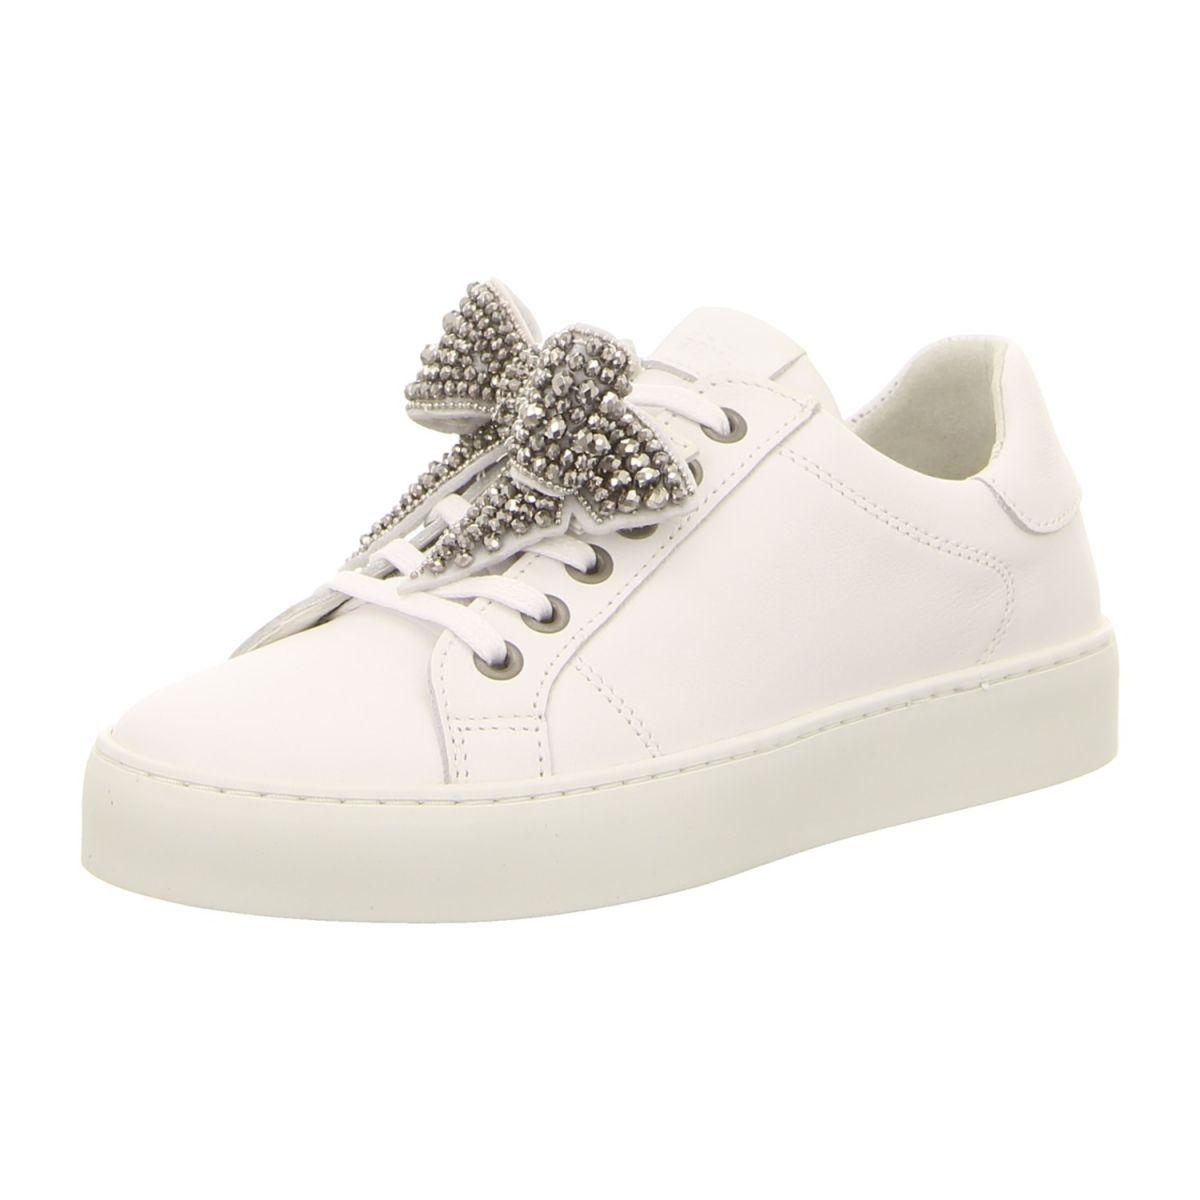 Bullboxer   Bullboxer zapatos  Sneaker 962040E5L_WHIT Blanco (weiß) NEU 54bdd4